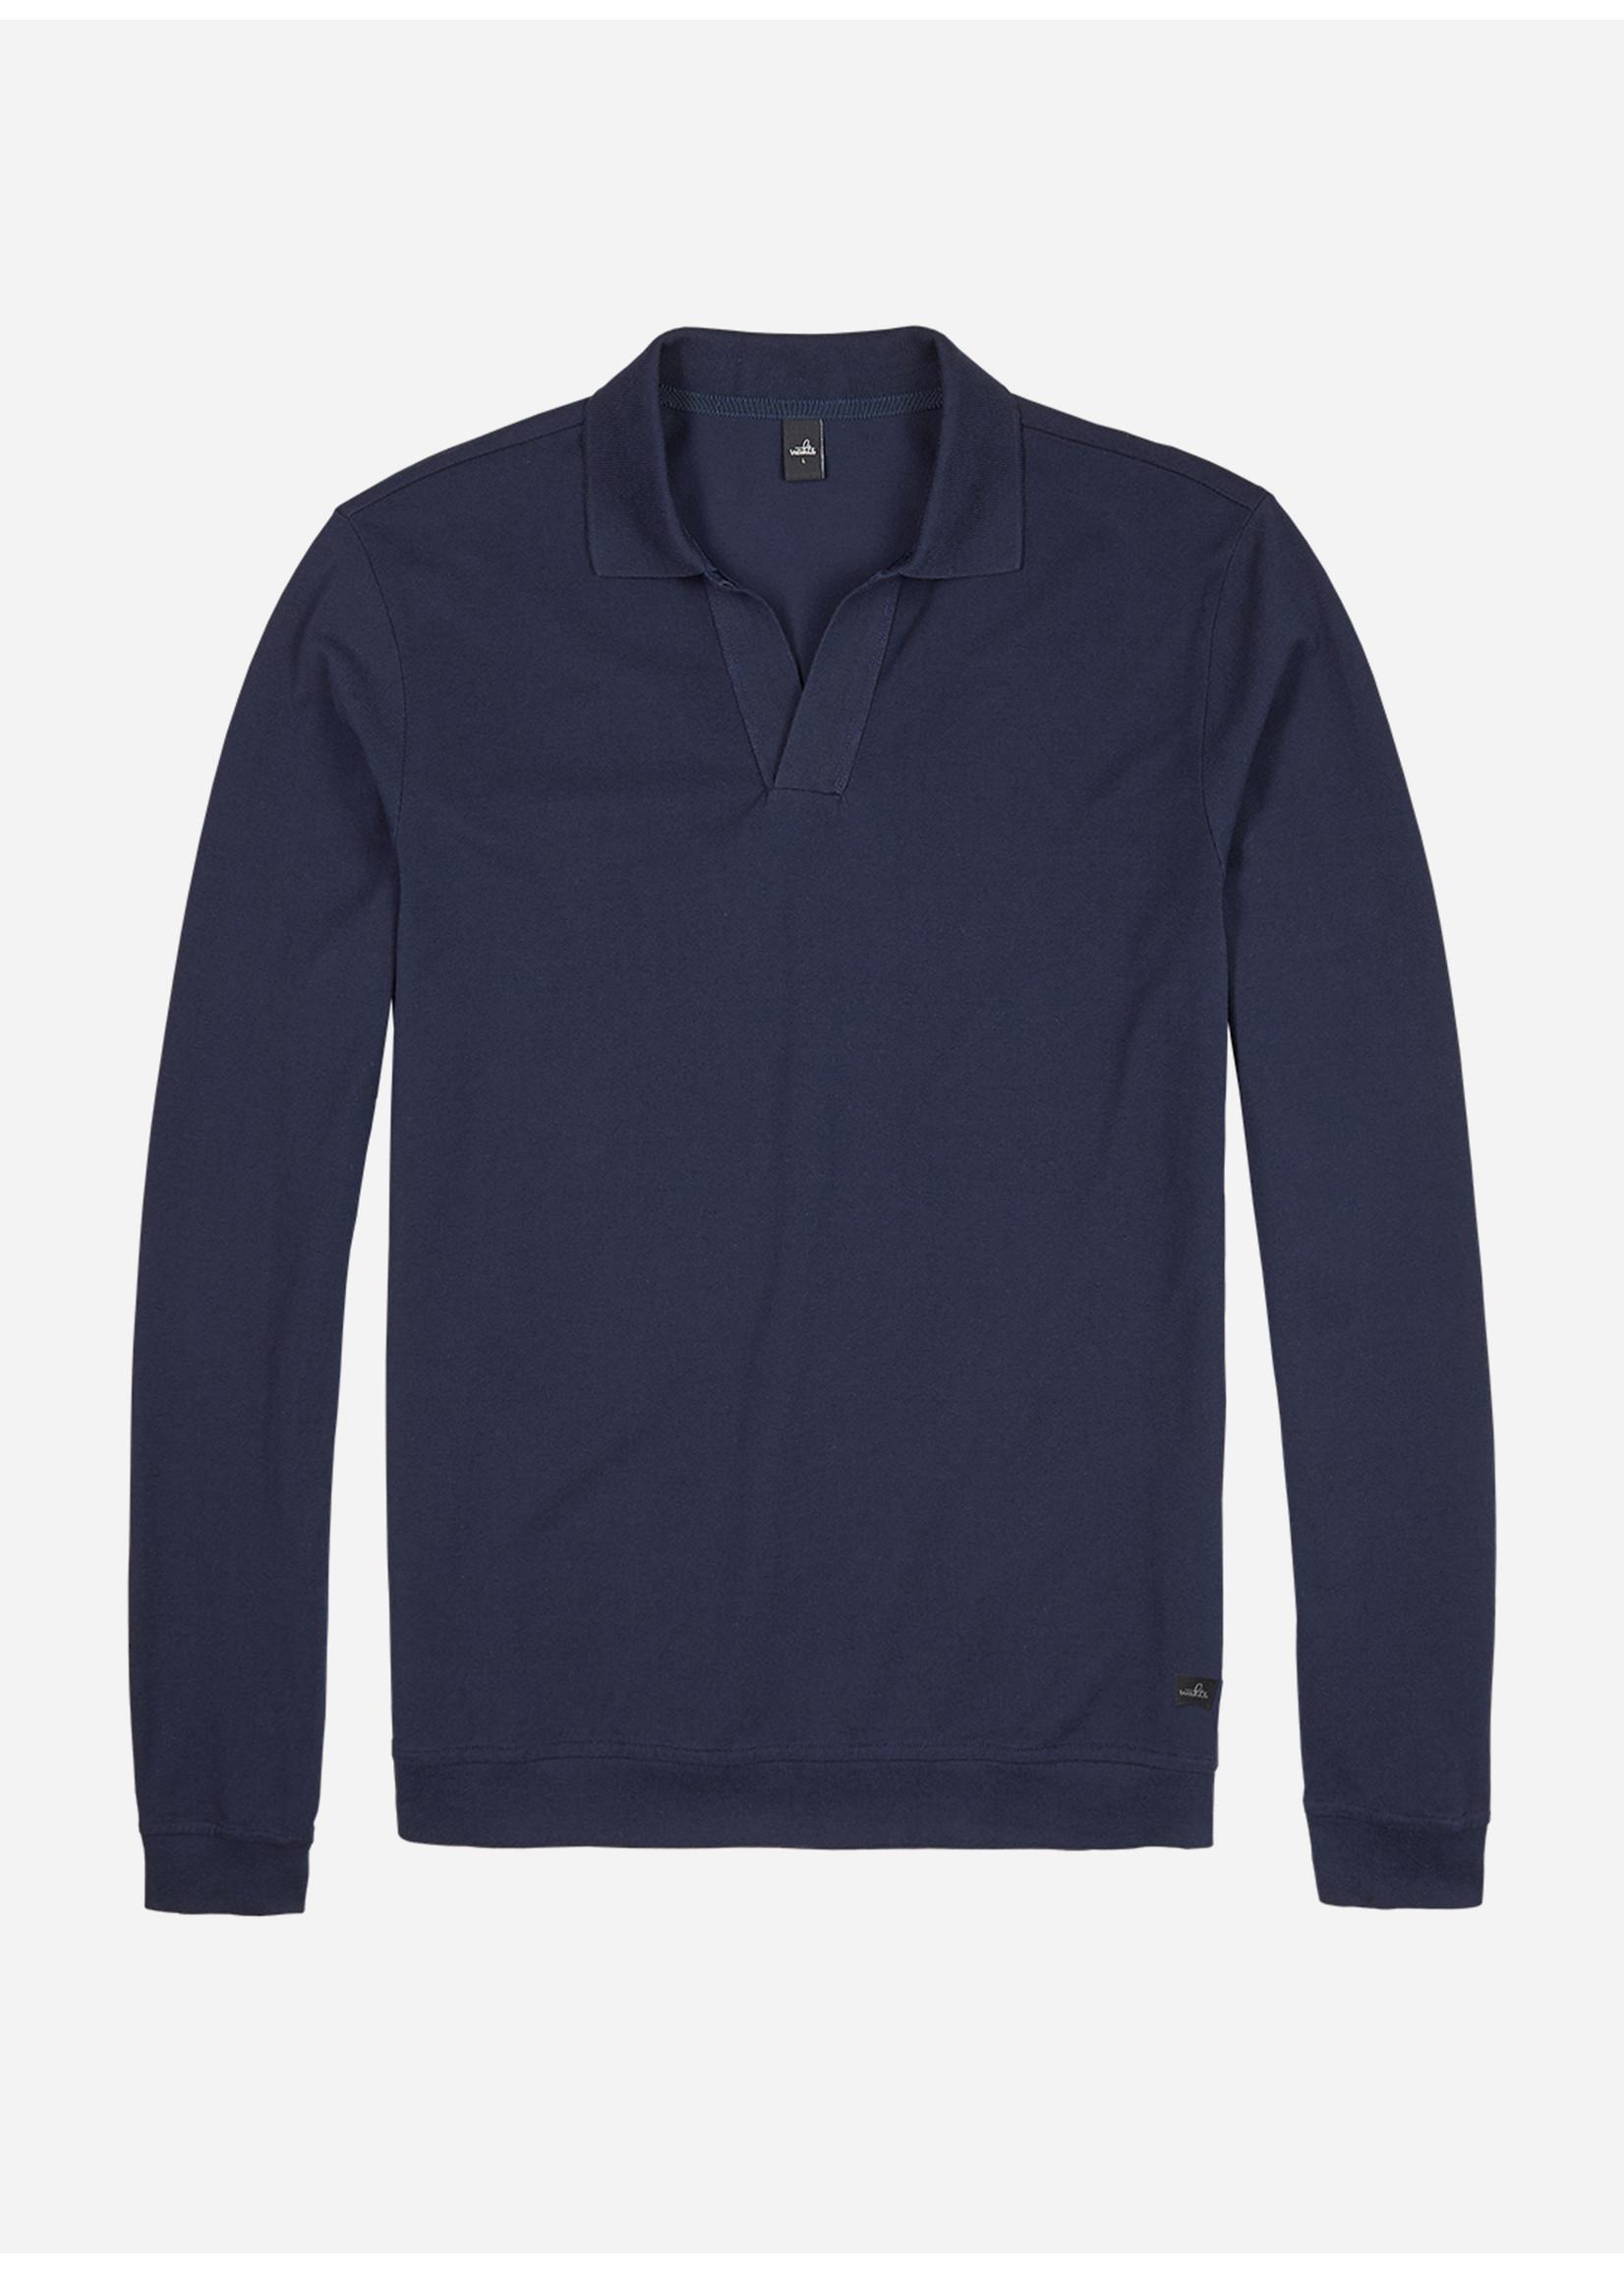 Wahts Barnet long sleeve retro polo shirt navy blue